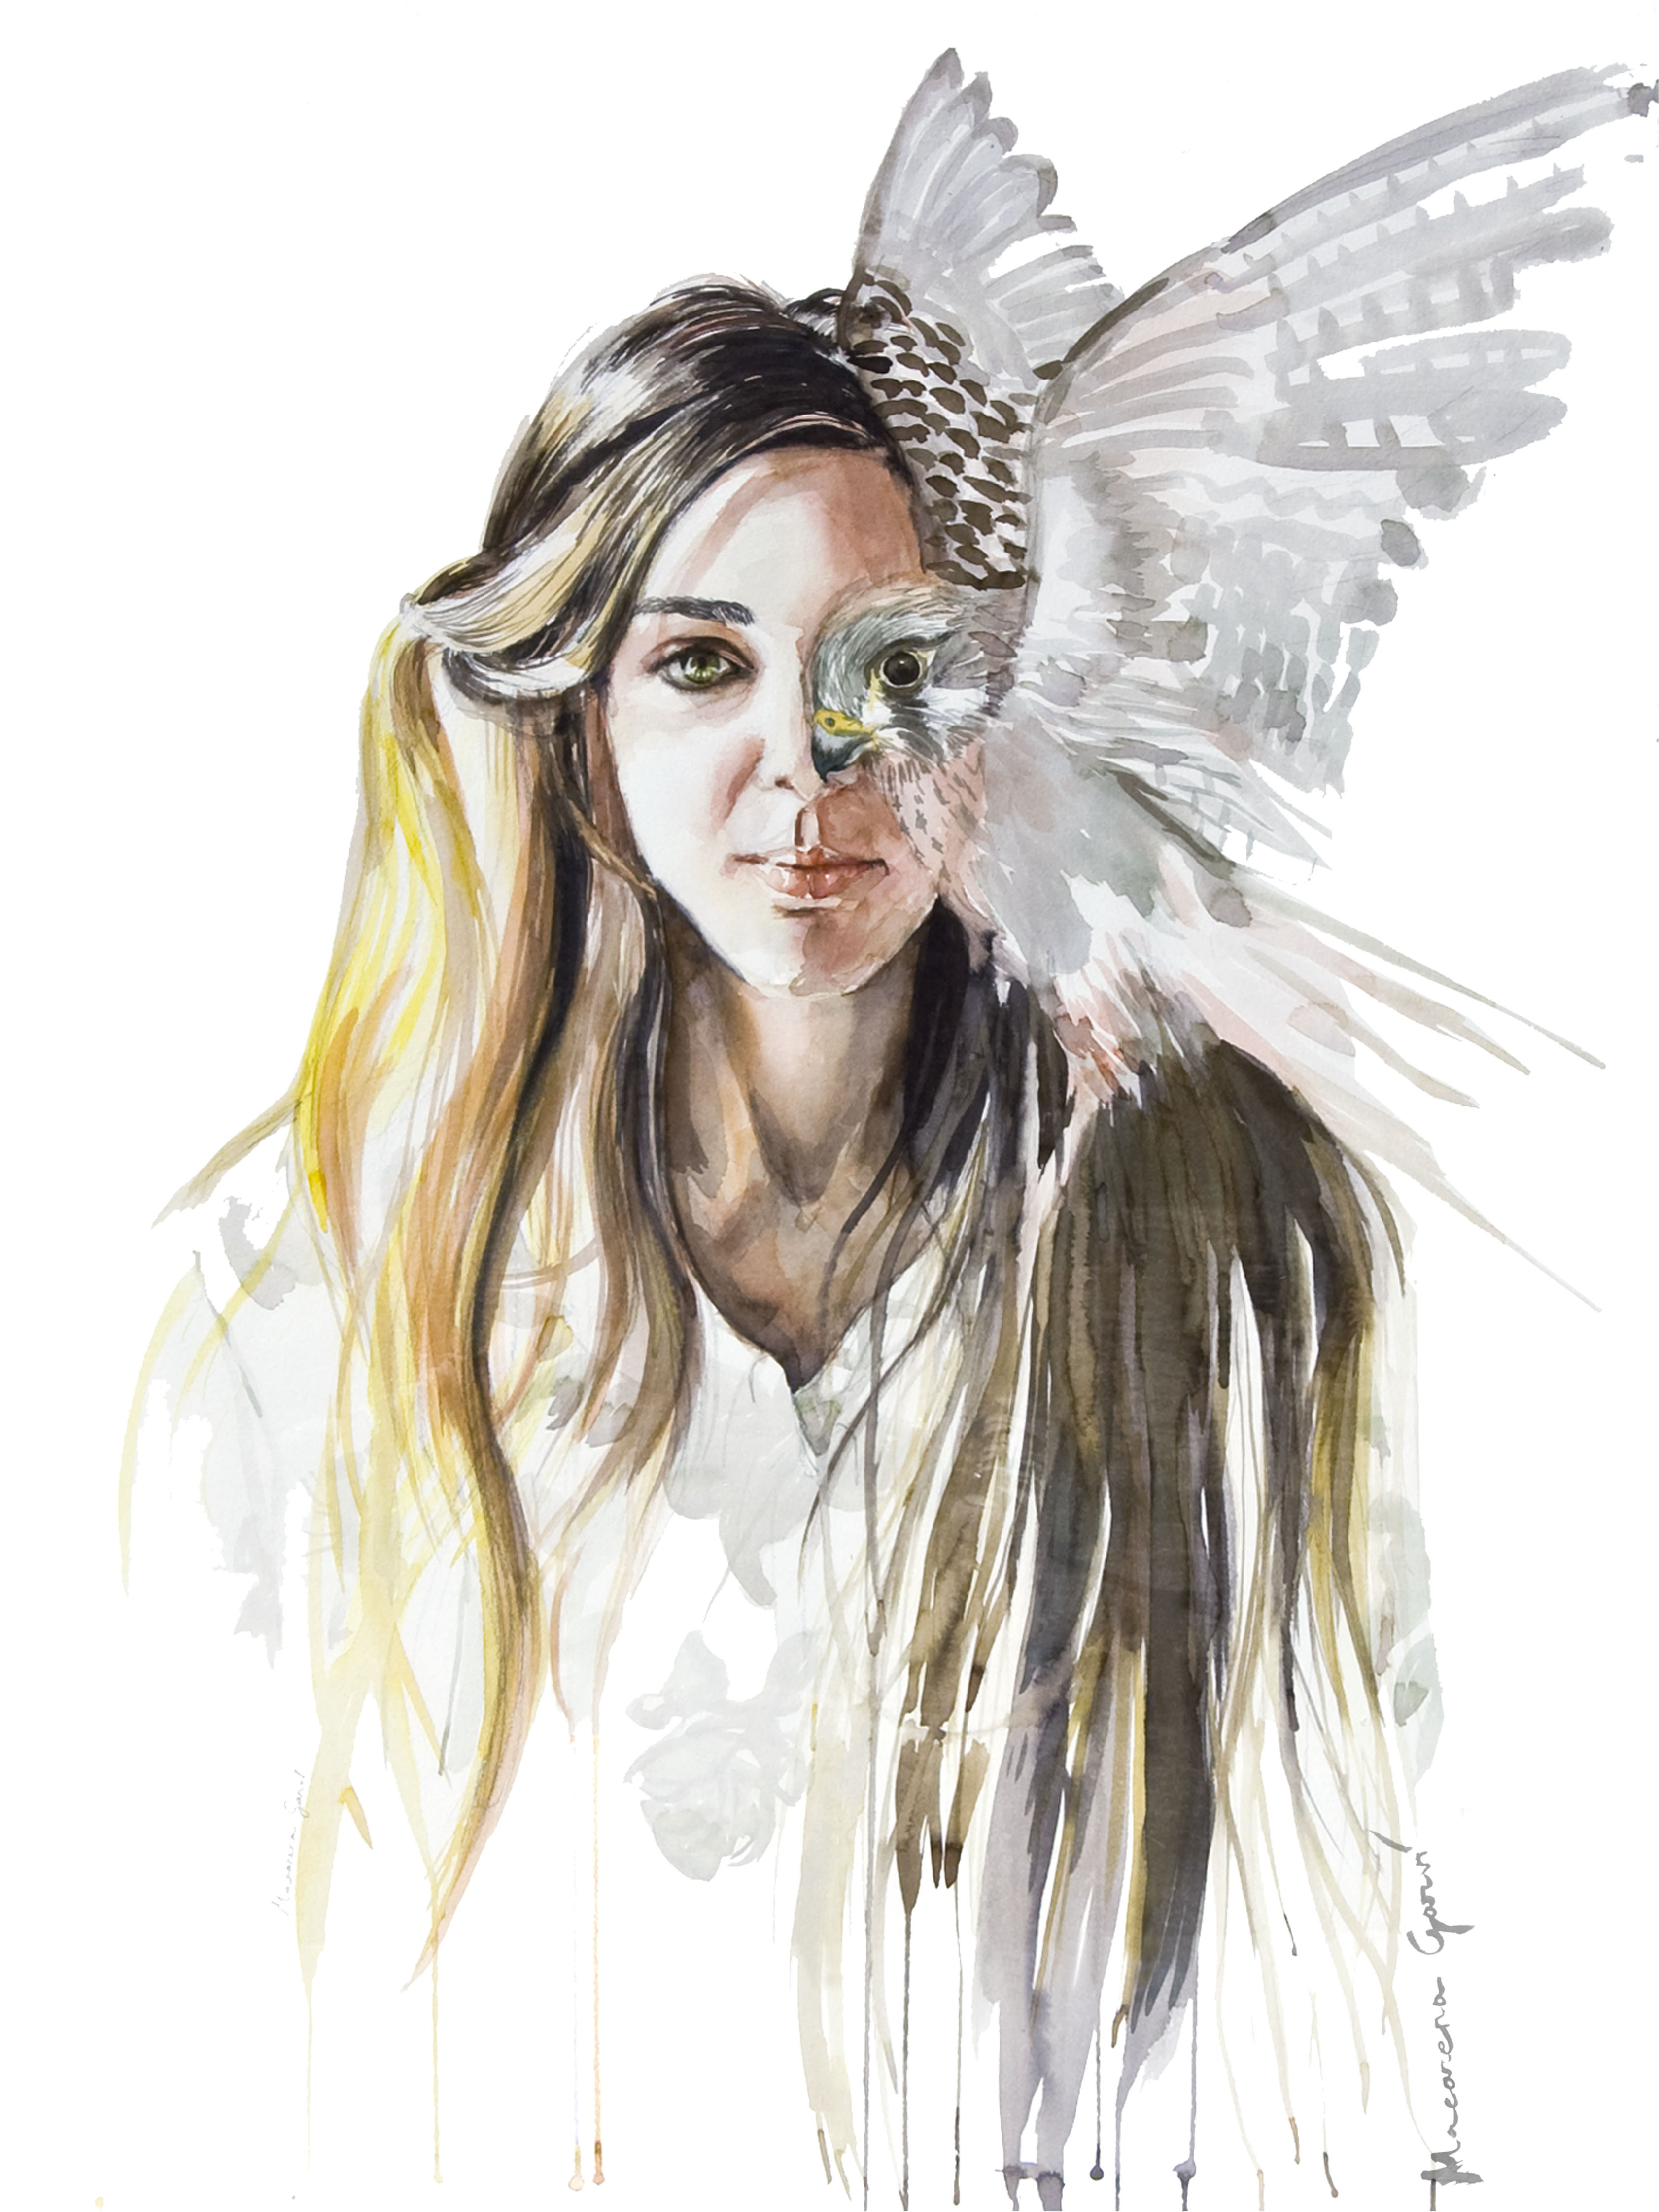 Mujer pájaro (2017) - Macarena Garví